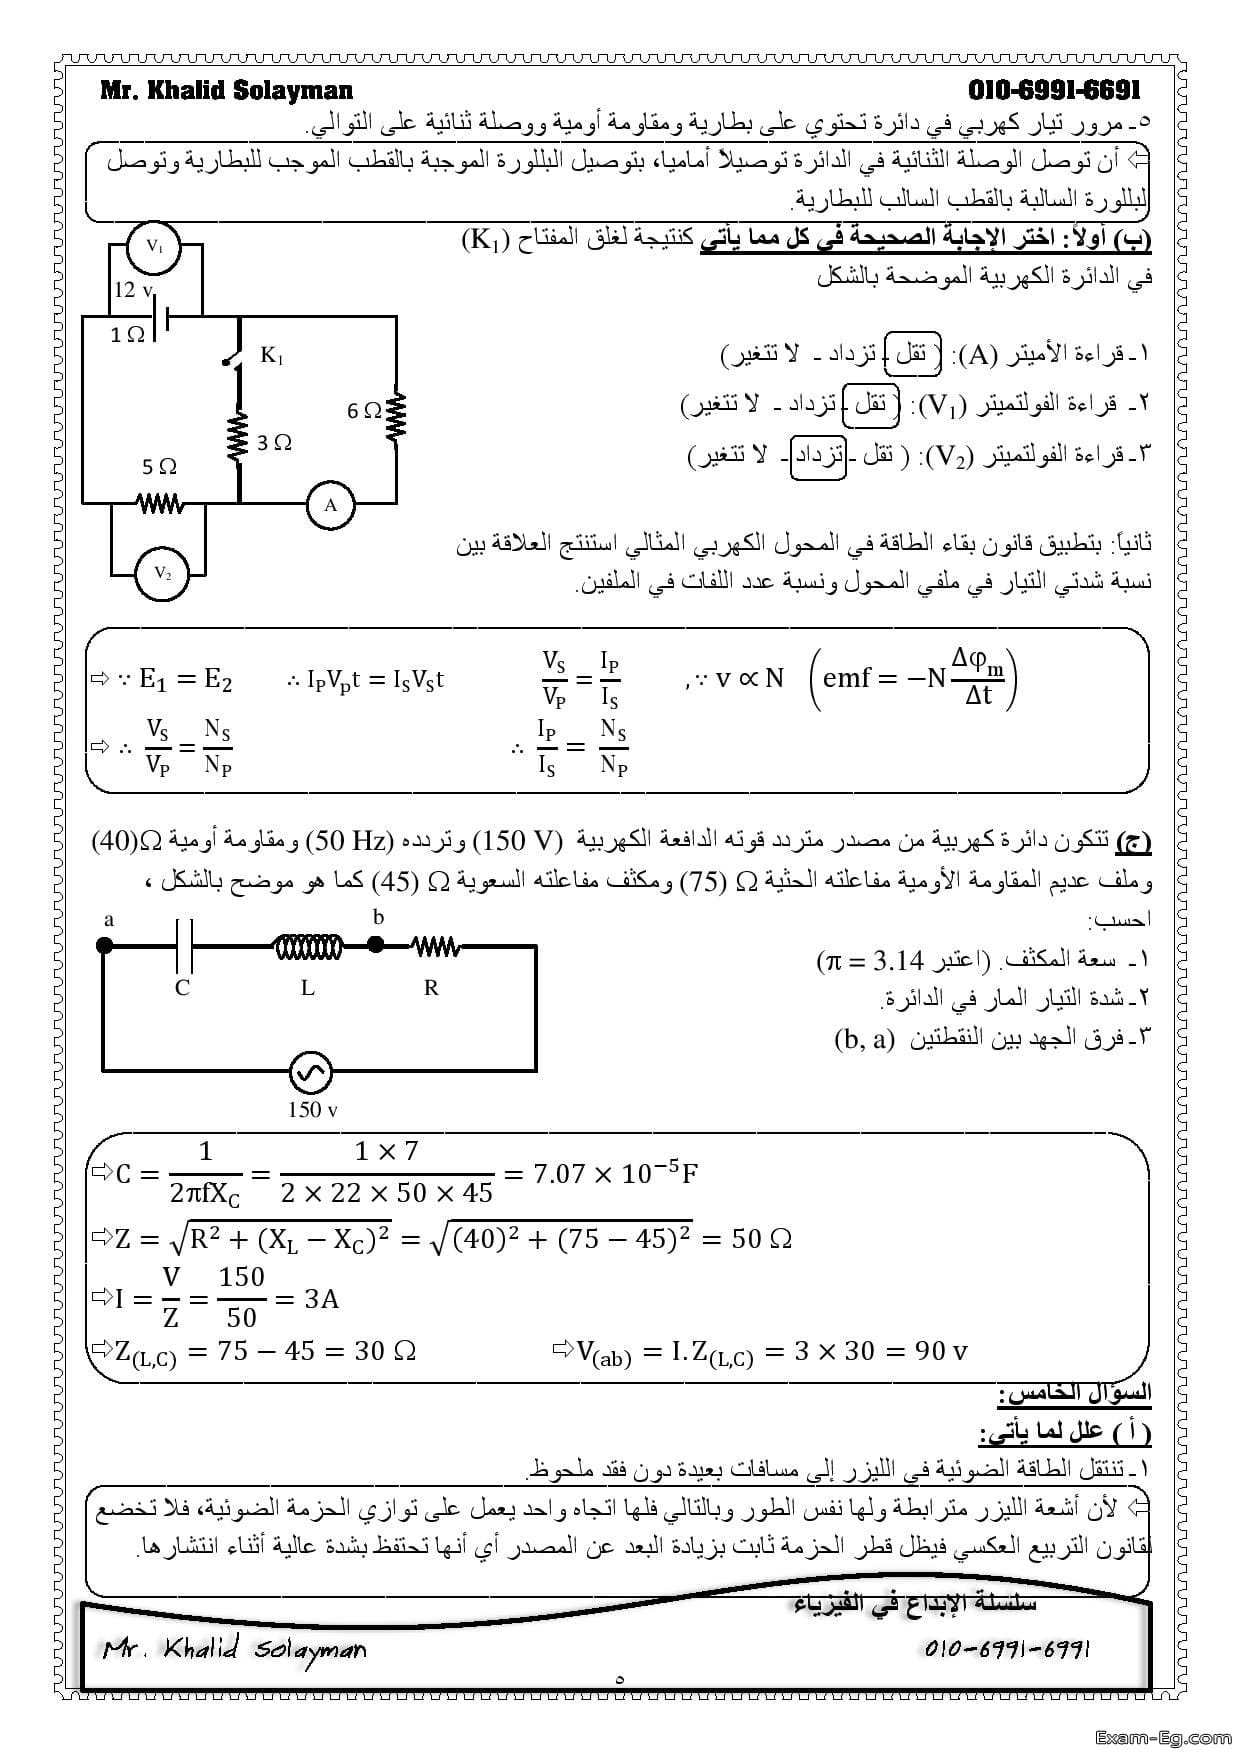 exam-eg.com_155647056857285.jpg